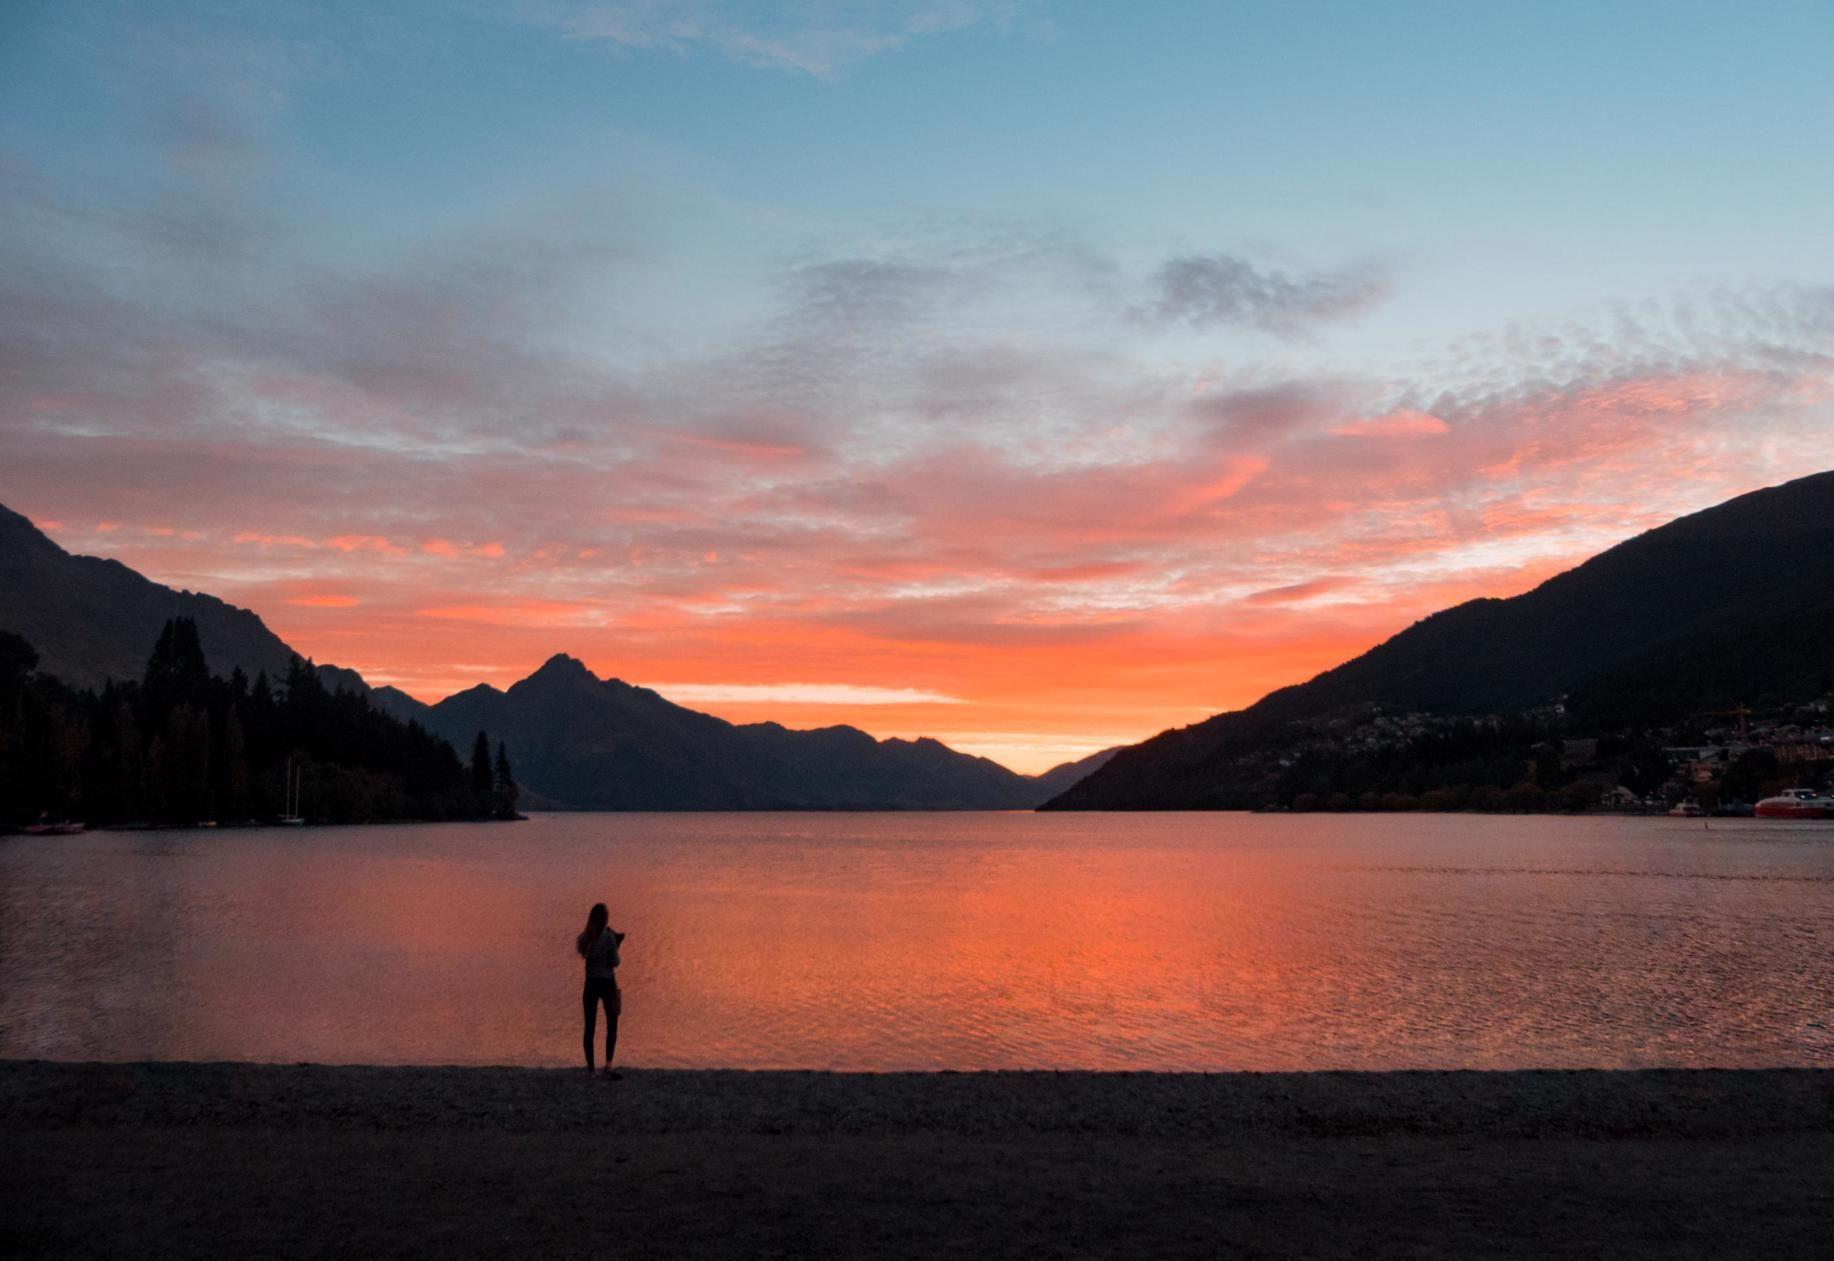 Things to do in Rotorua New Zealand include beautiful lakes